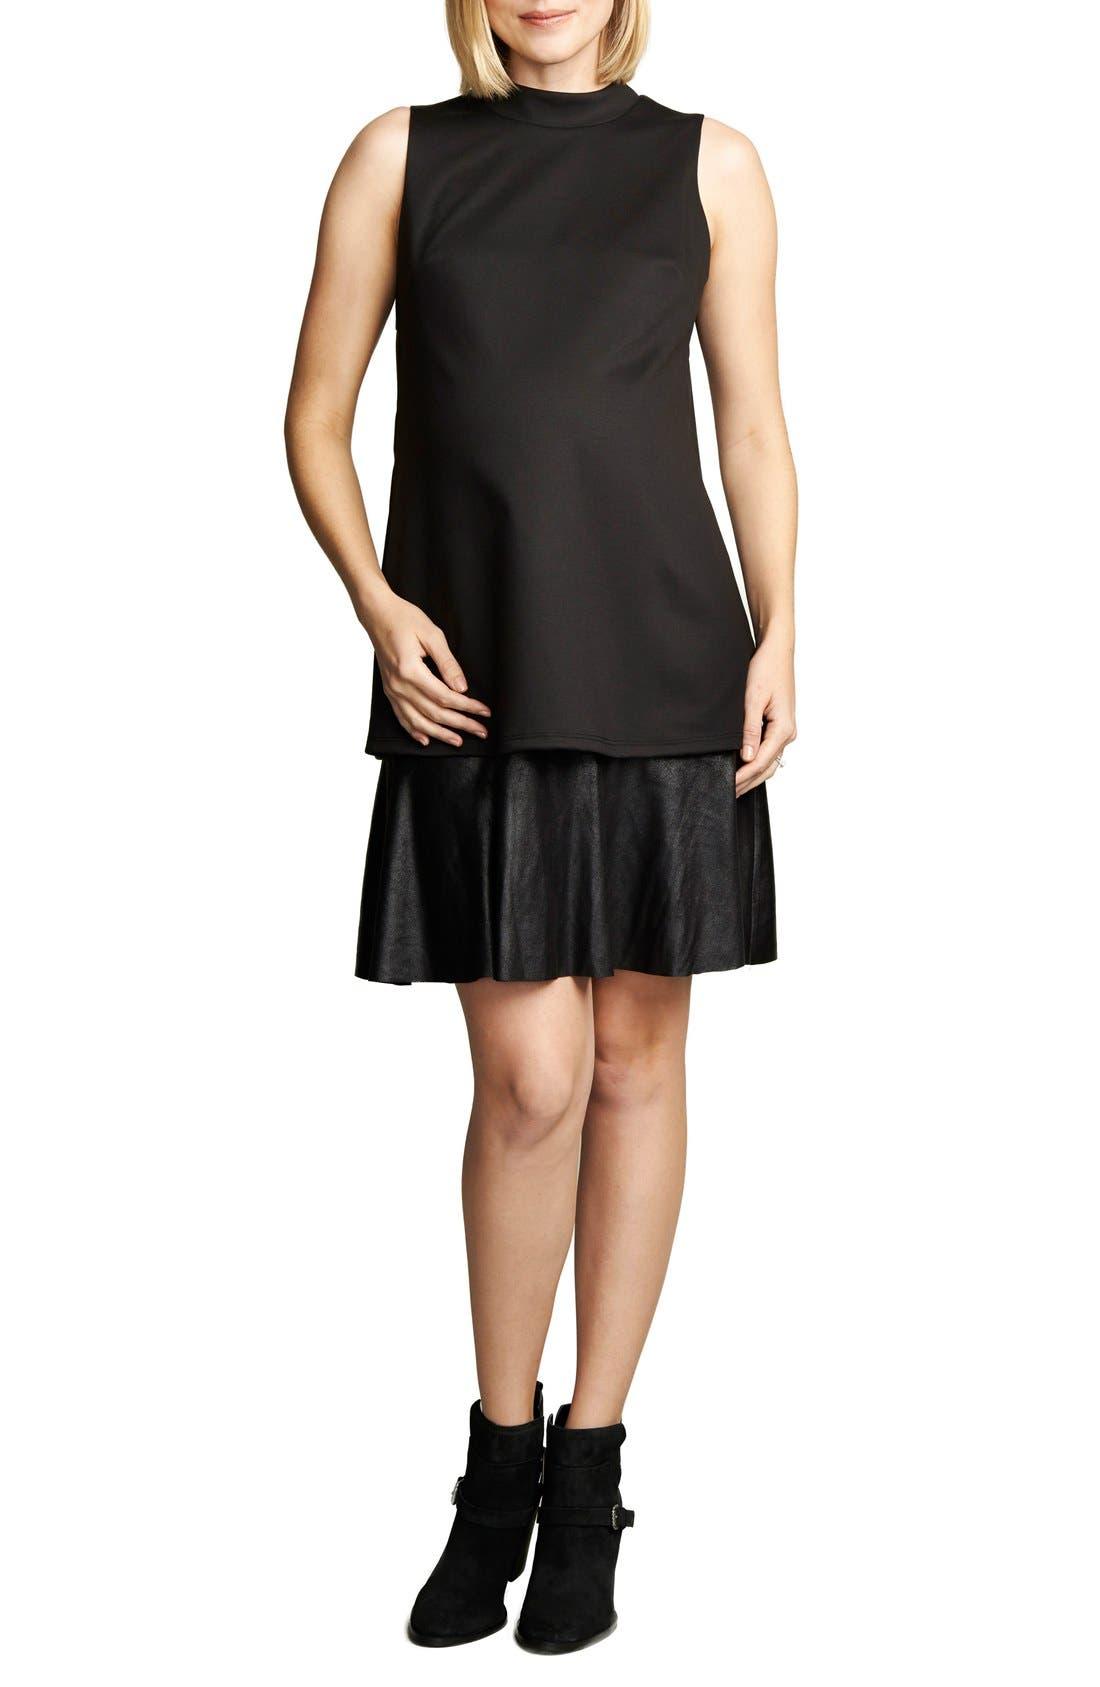 'Lucy' Maternity Dress,                             Main thumbnail 1, color,                             Black/Vegan Suede